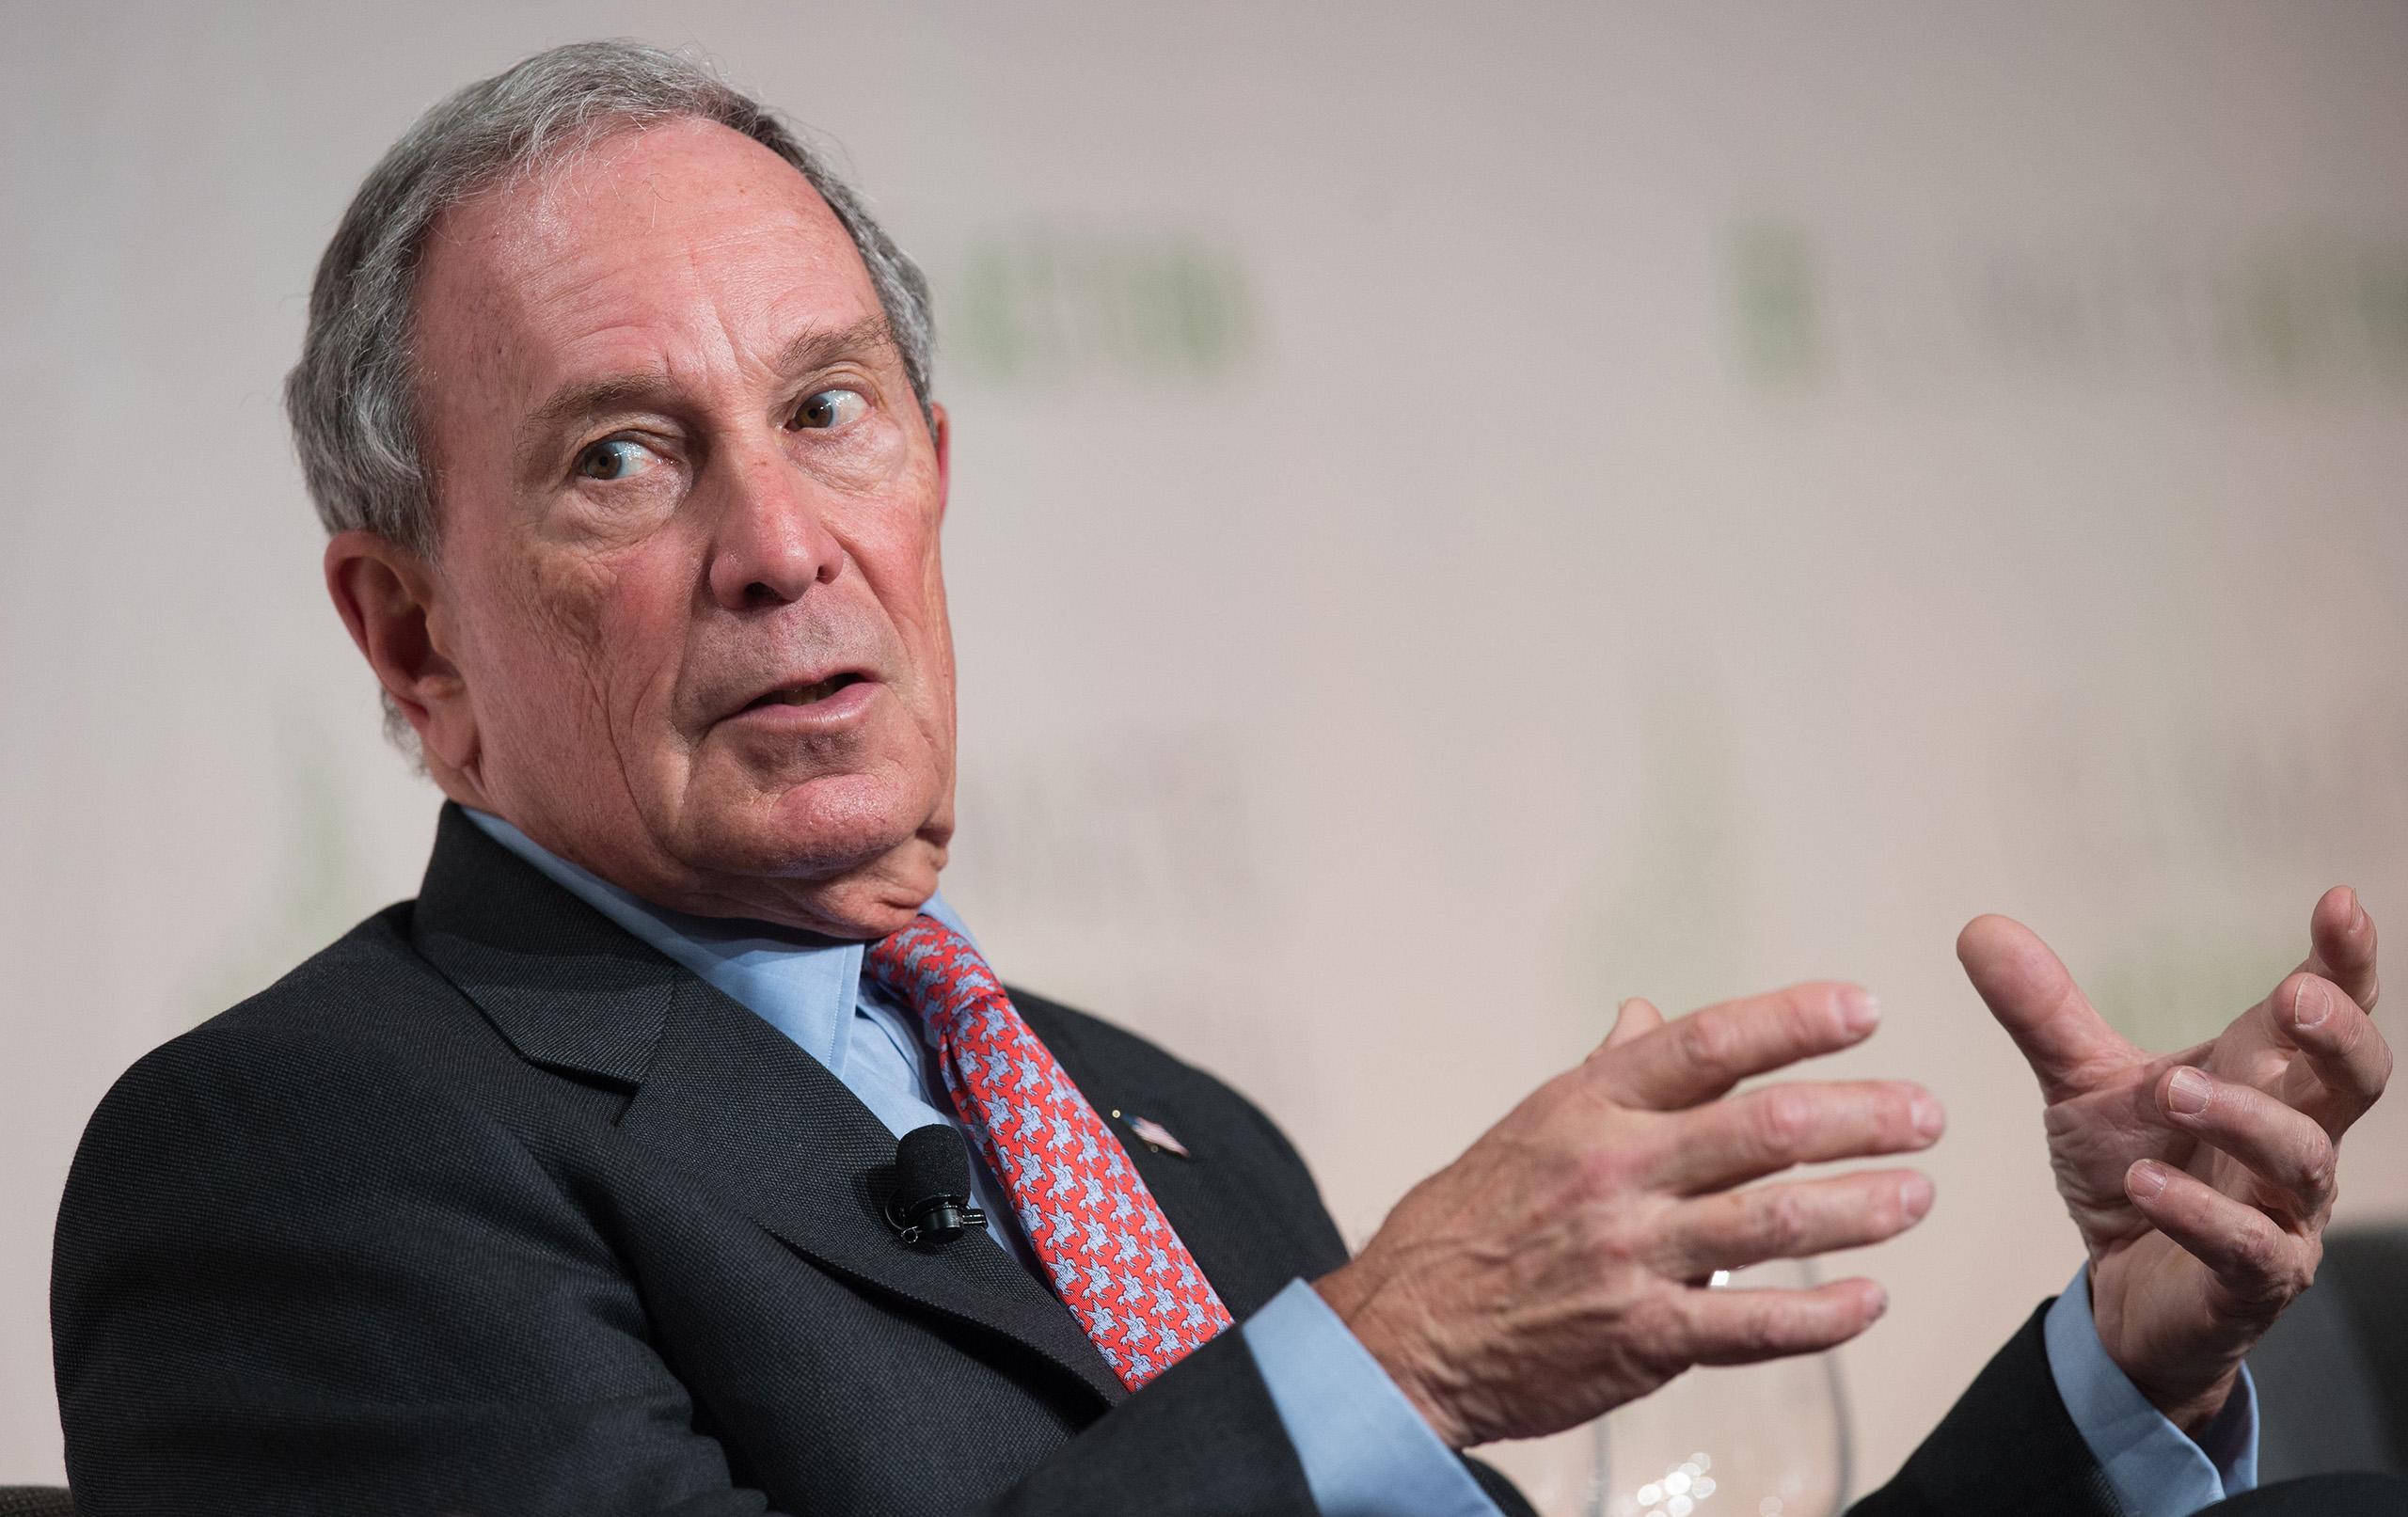 10-Michael Bloomberg 51,8 milyar $